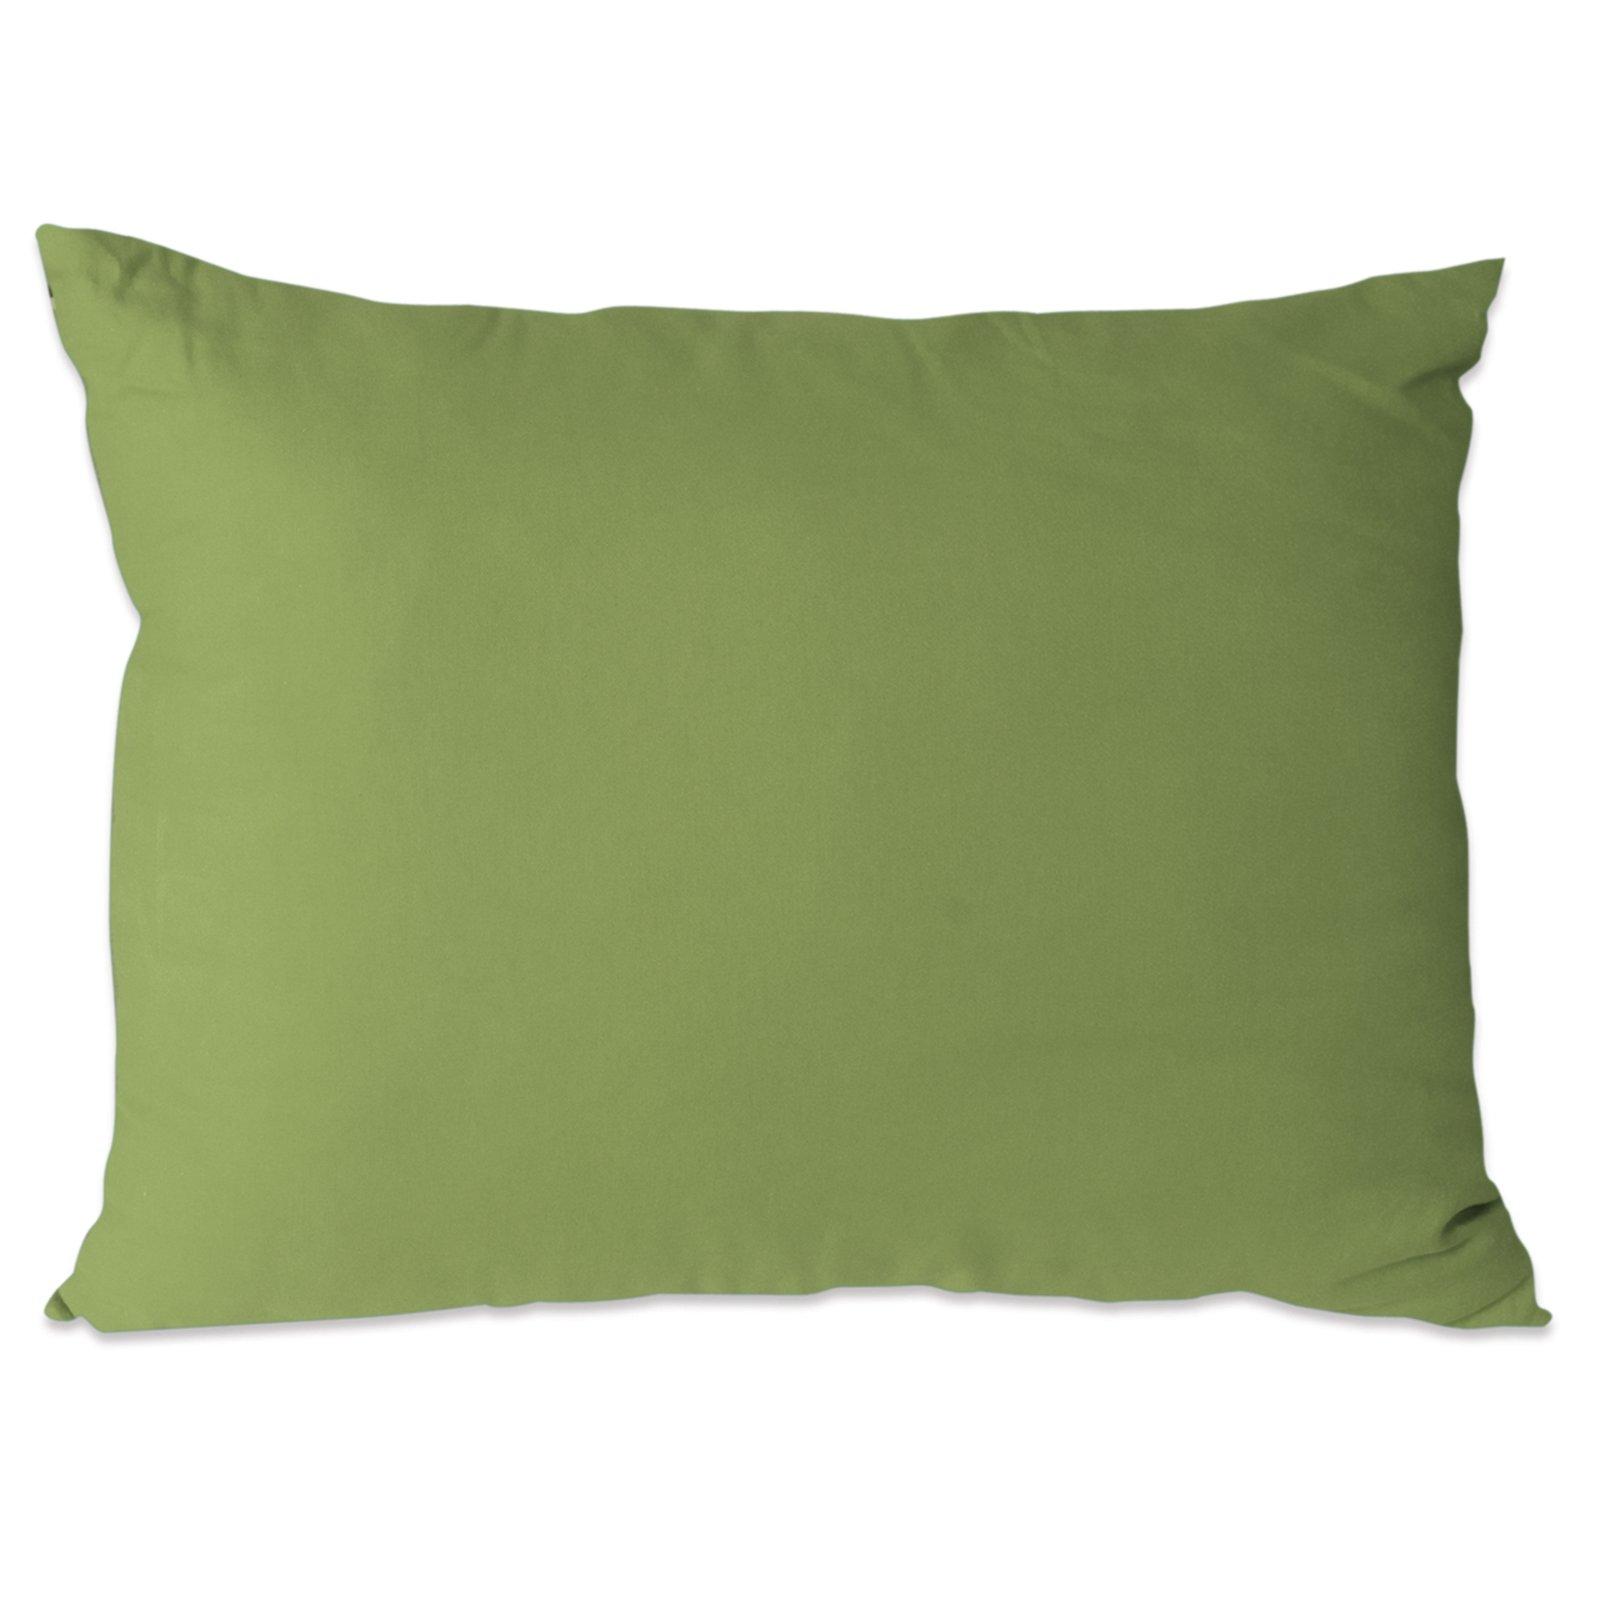 Jumbo-Kissen - grün - 60x80 cm